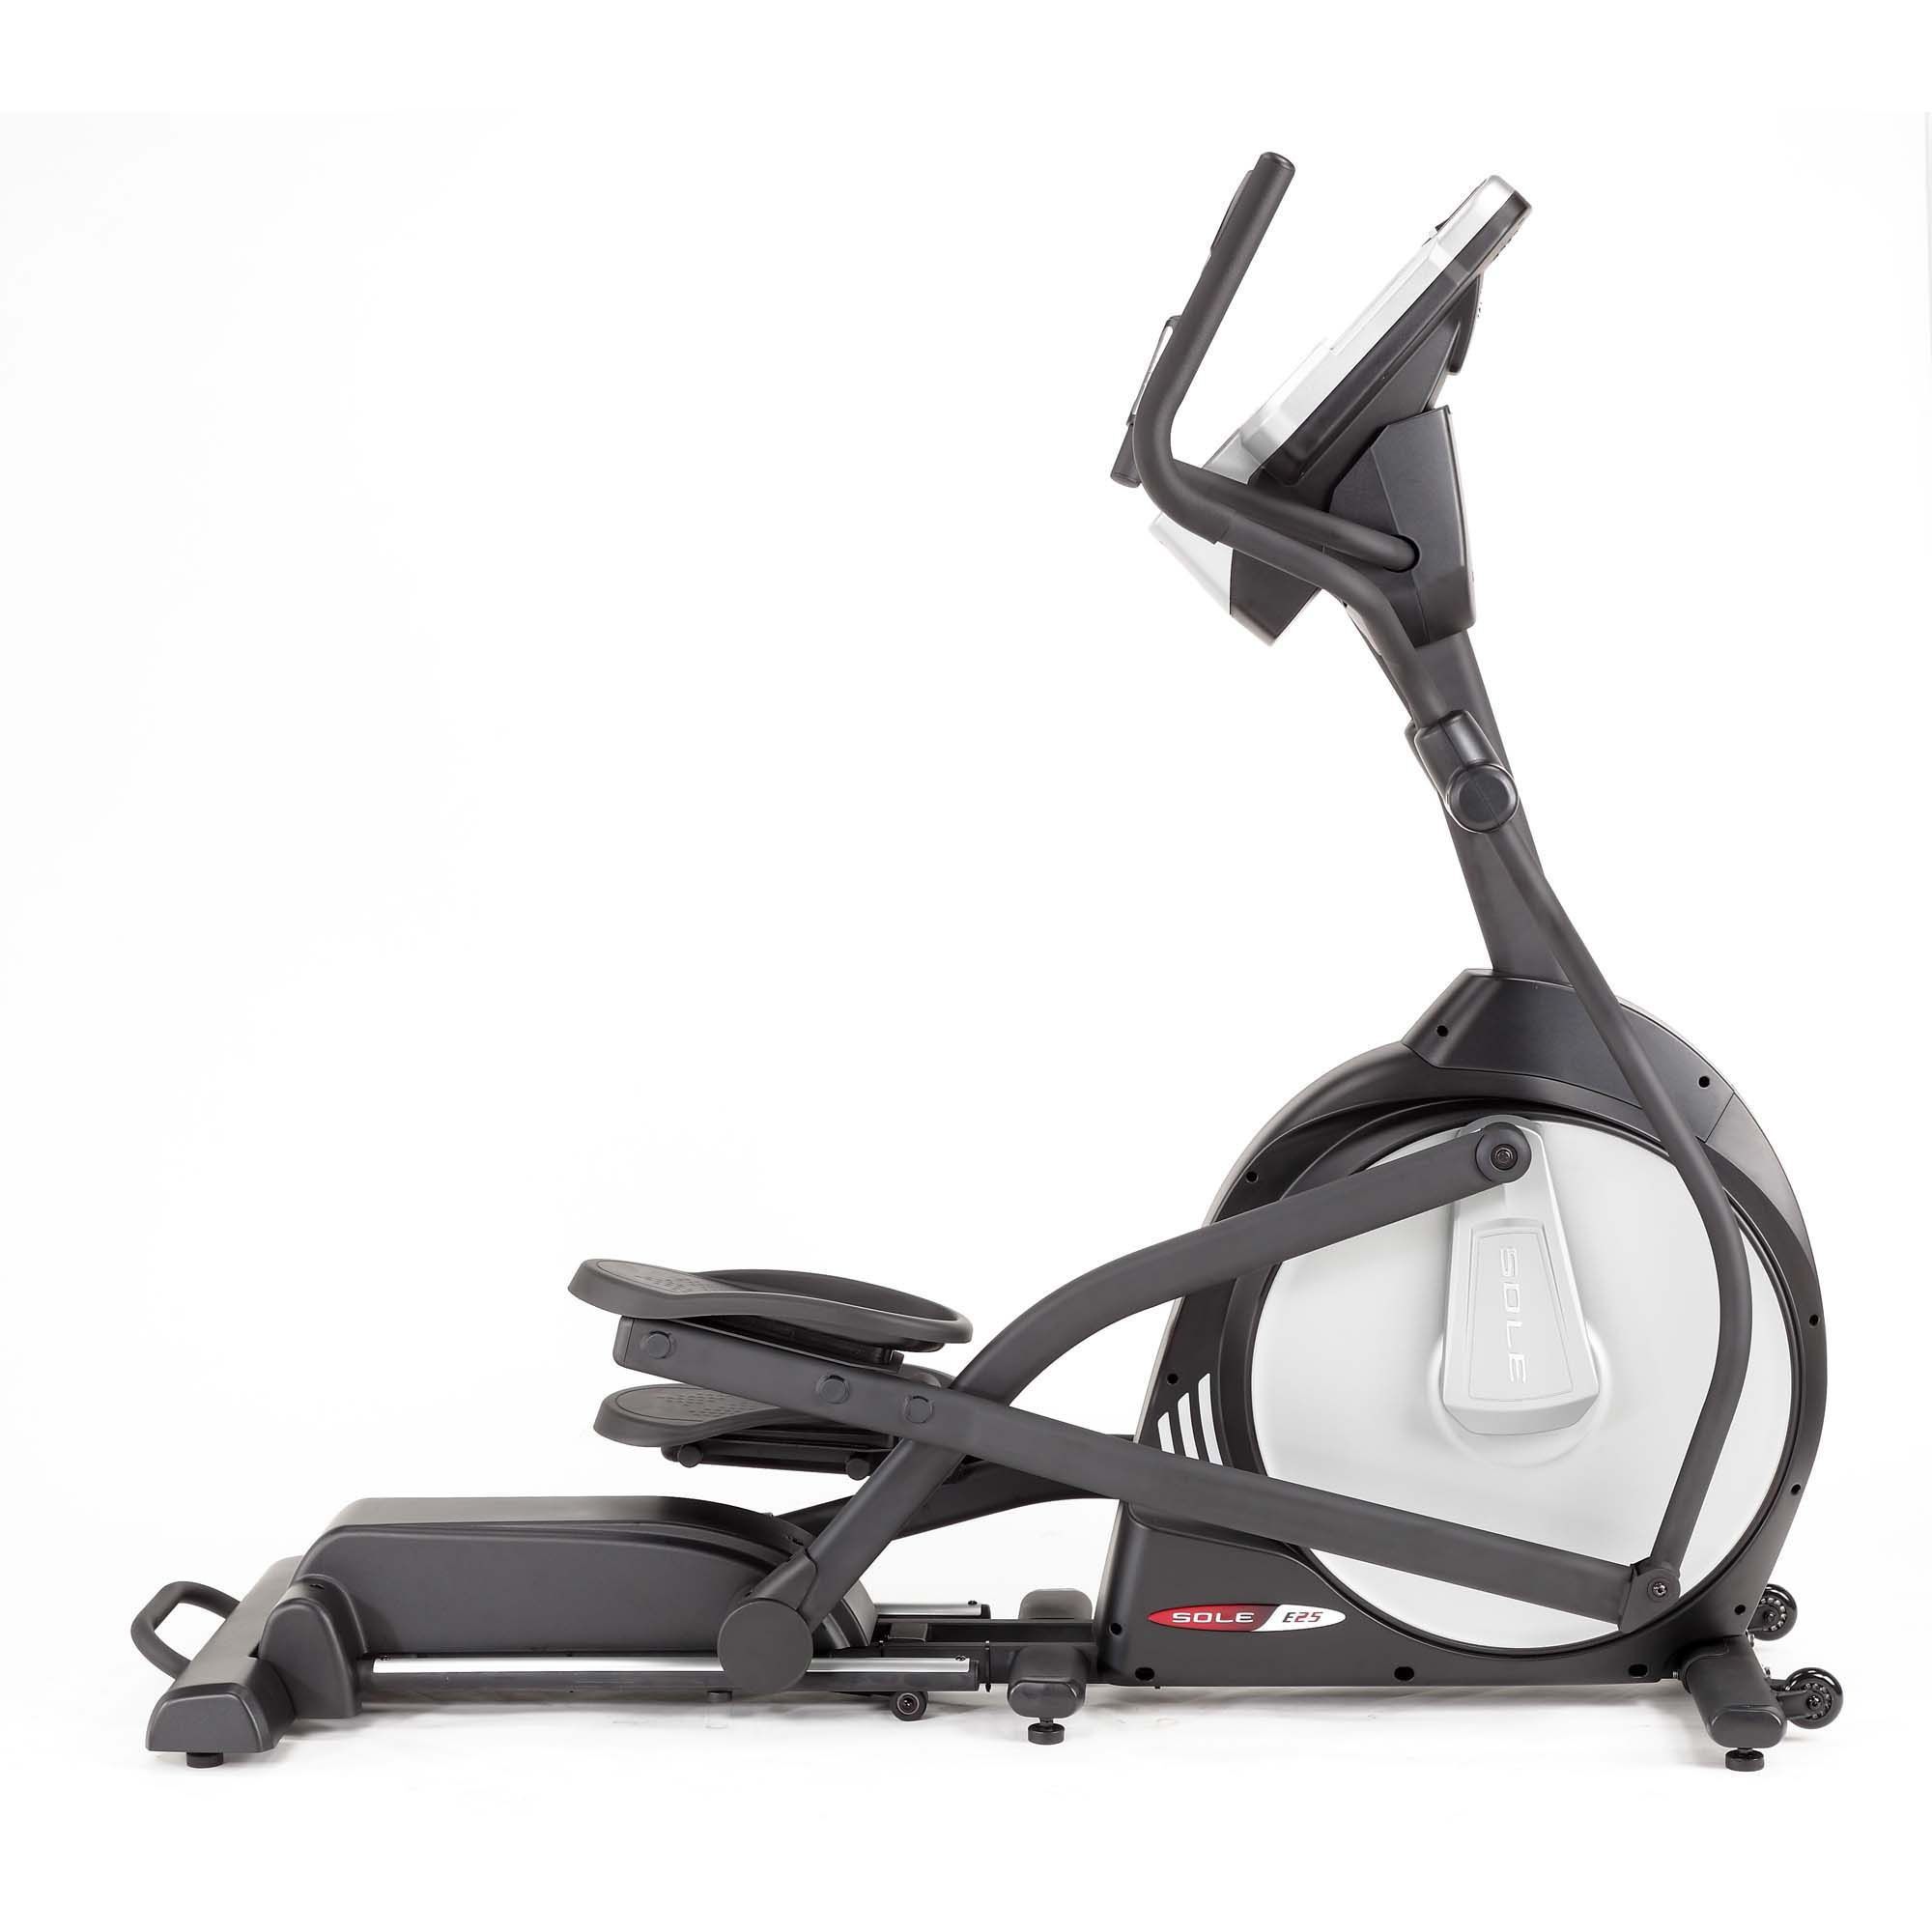 Fitness Equipment Stores Darwin Cbd, Sole E25 Cross